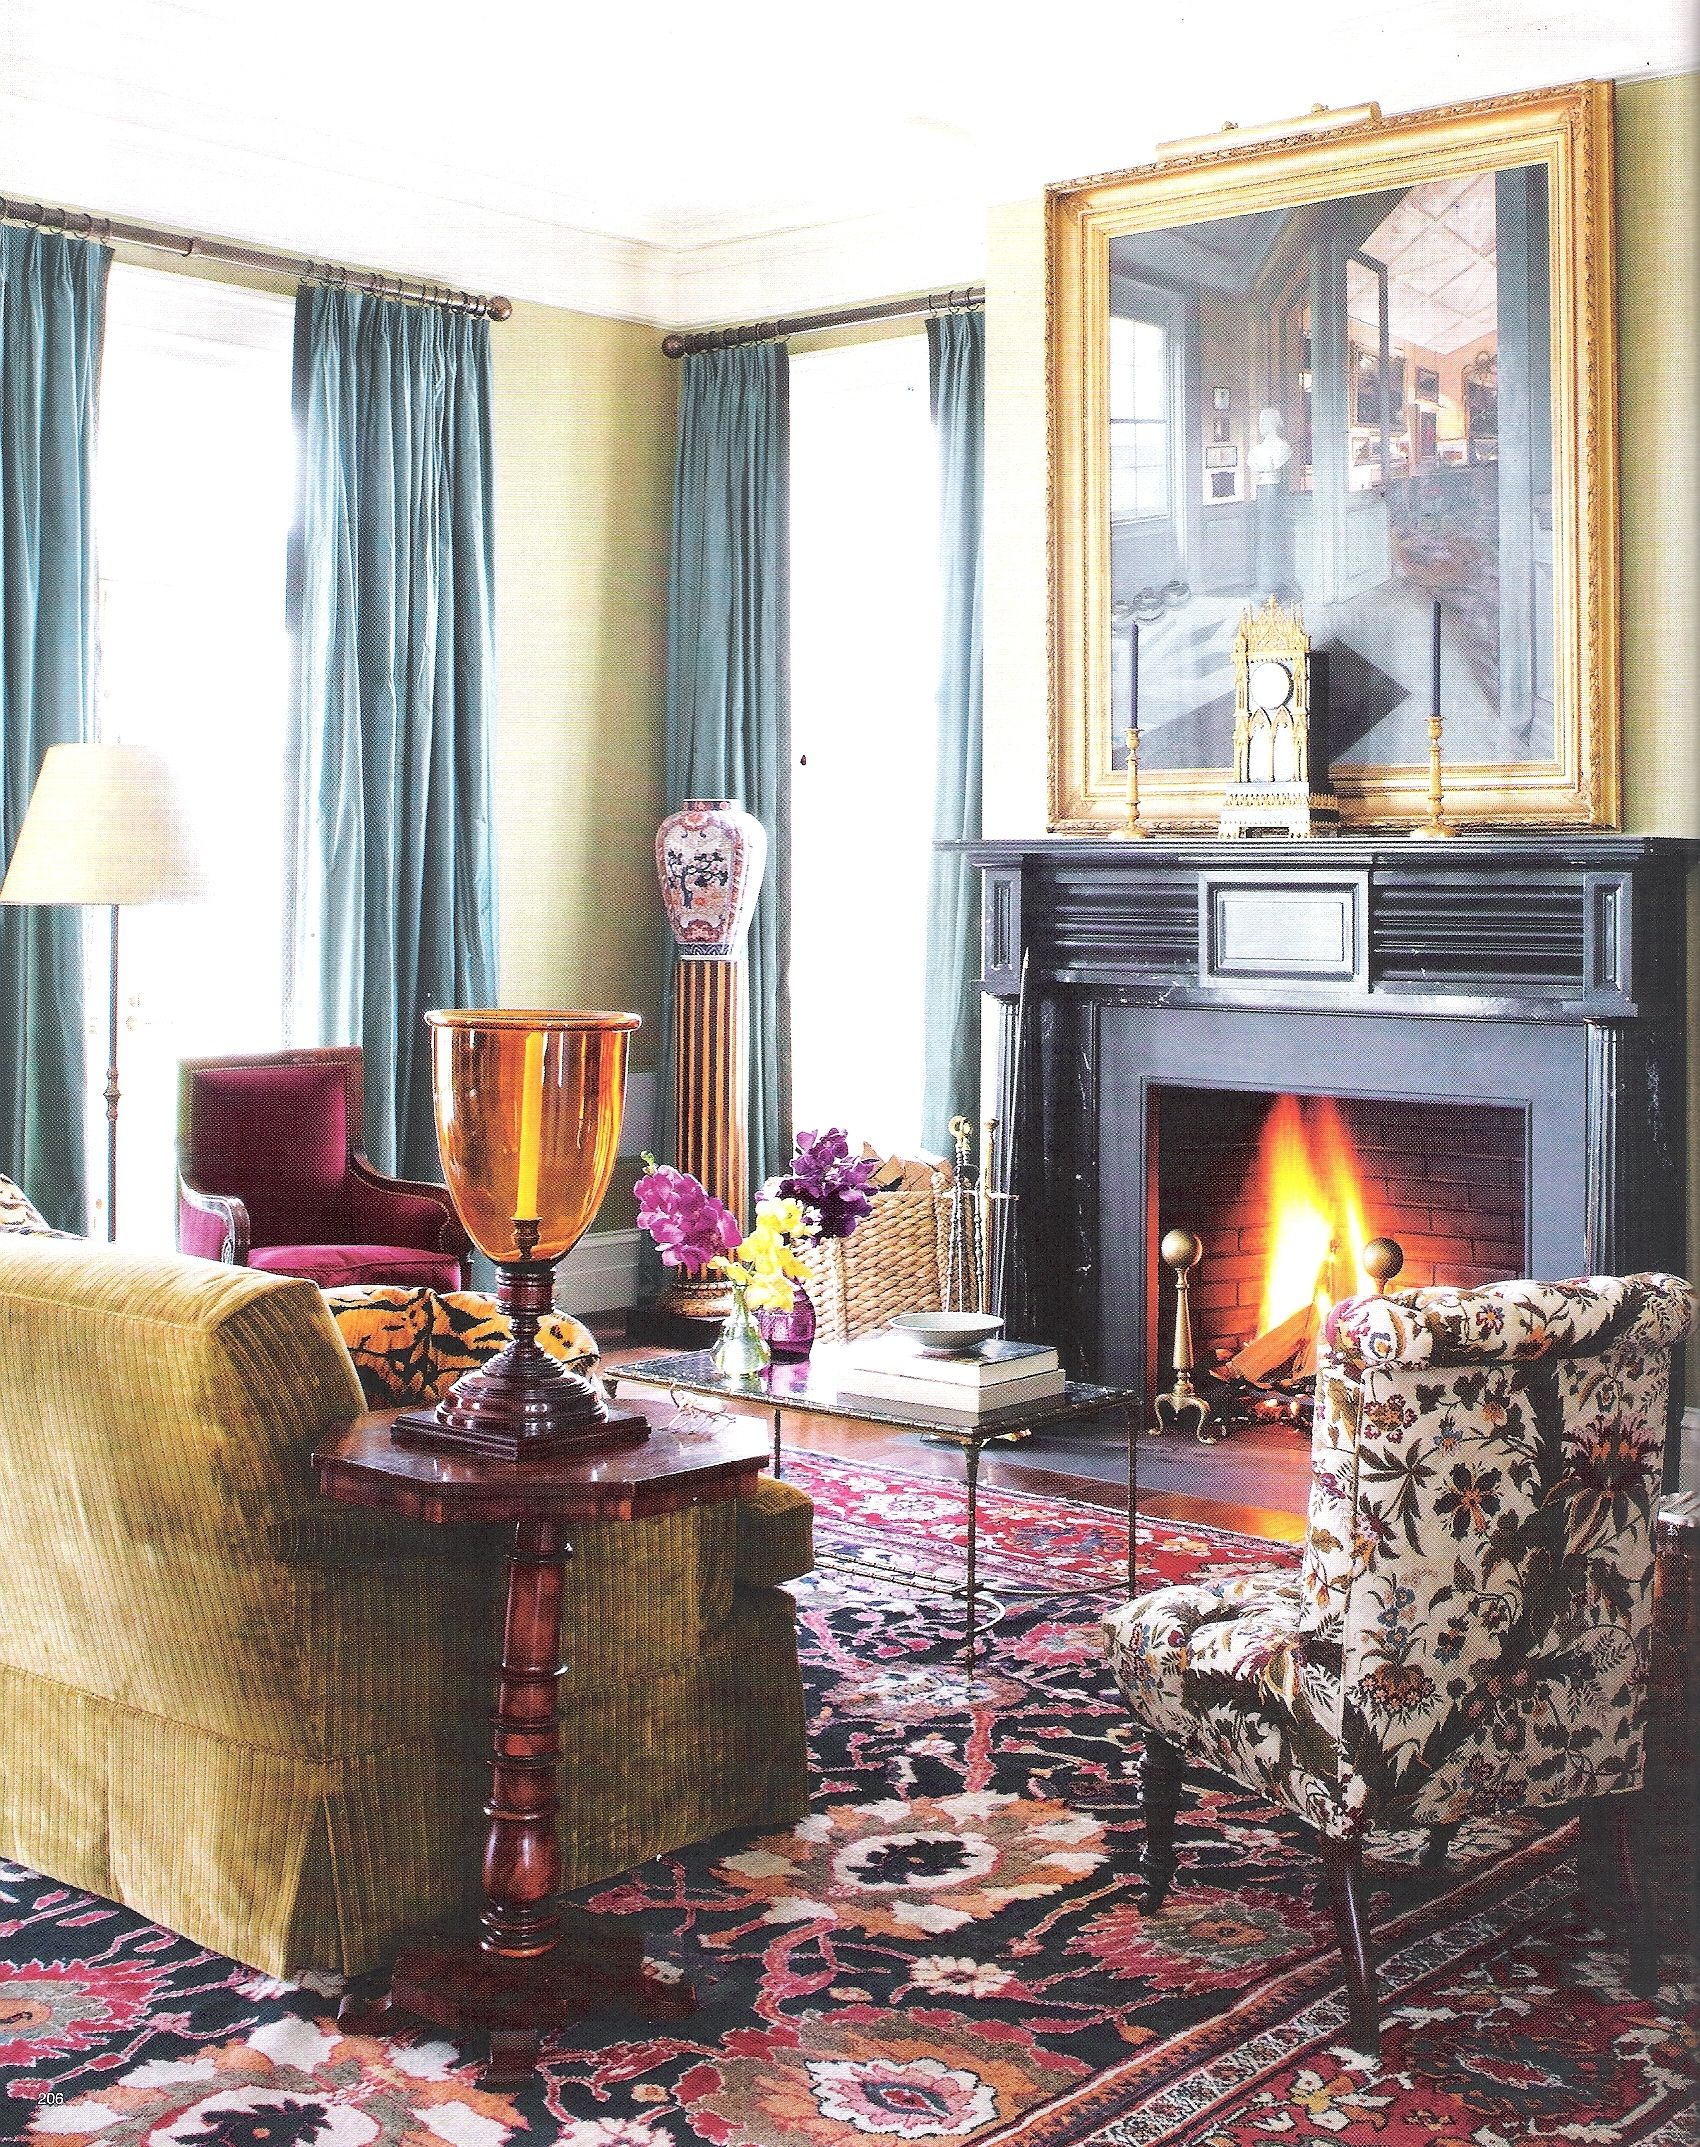 Living Room - home in upstate New York, Miles Redd Interior Design. Image Elle Decor